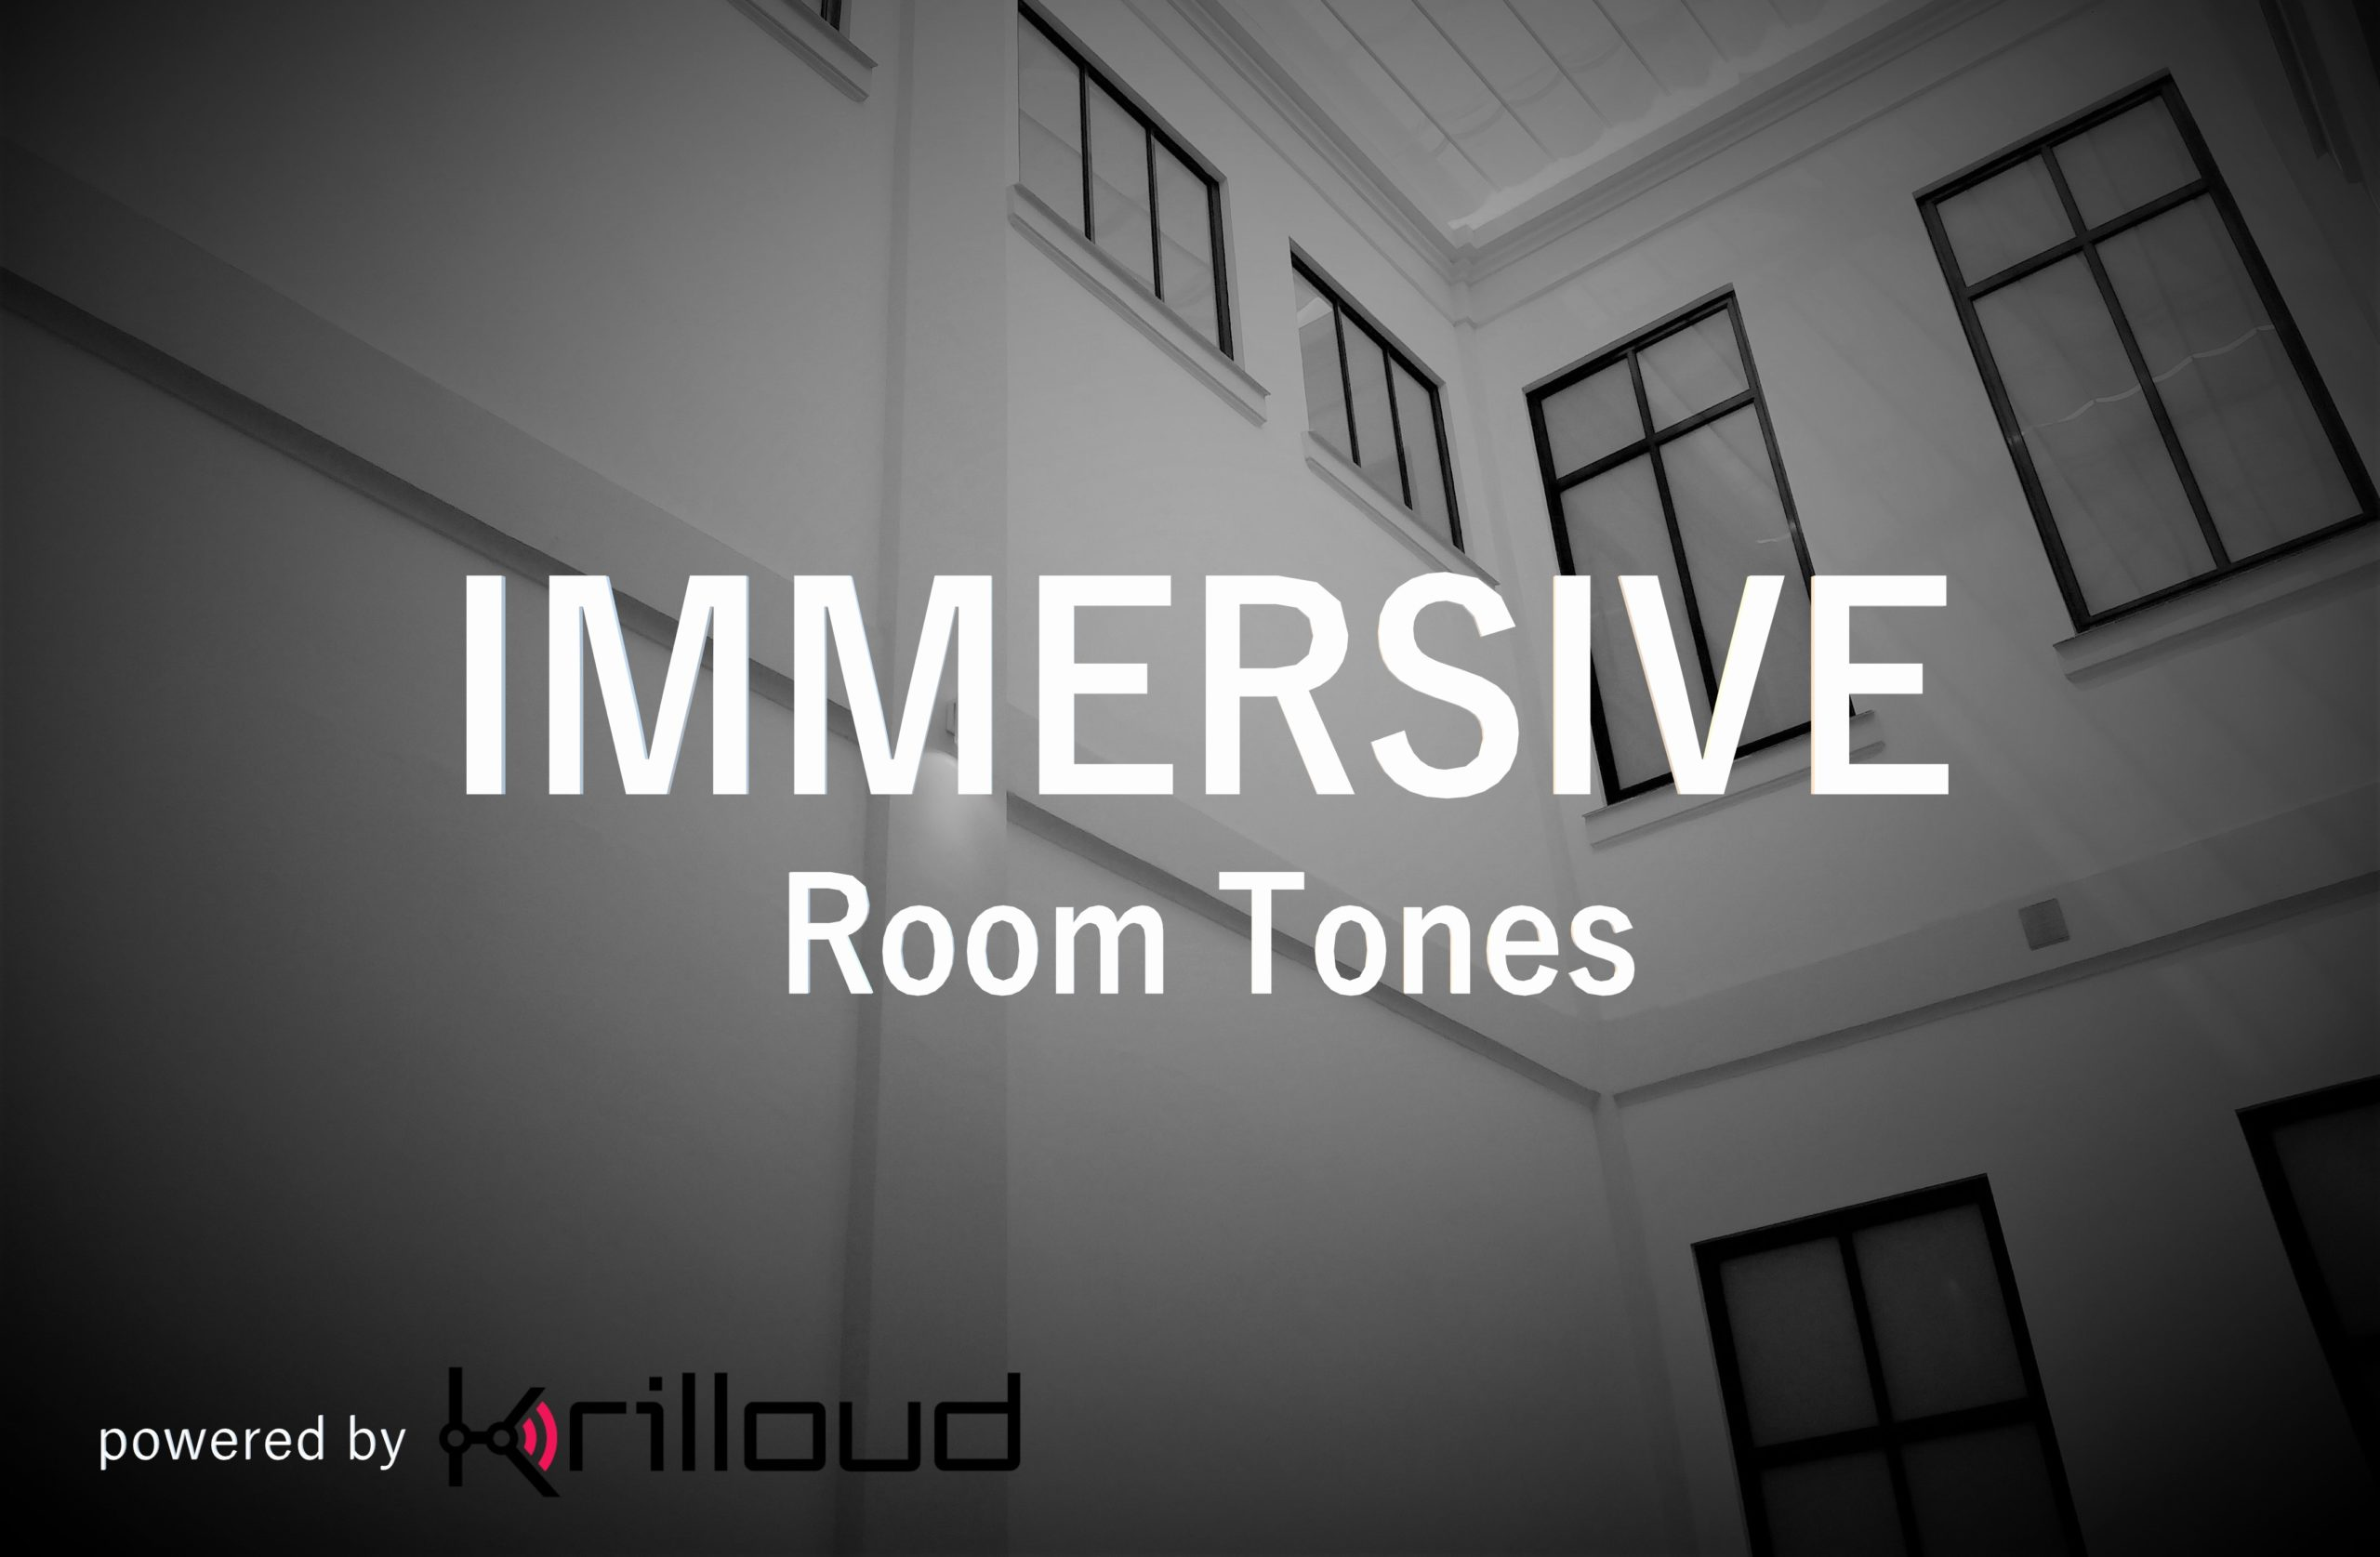 Krilloud Immersive Room Tones [1.5GB+ Free Download]